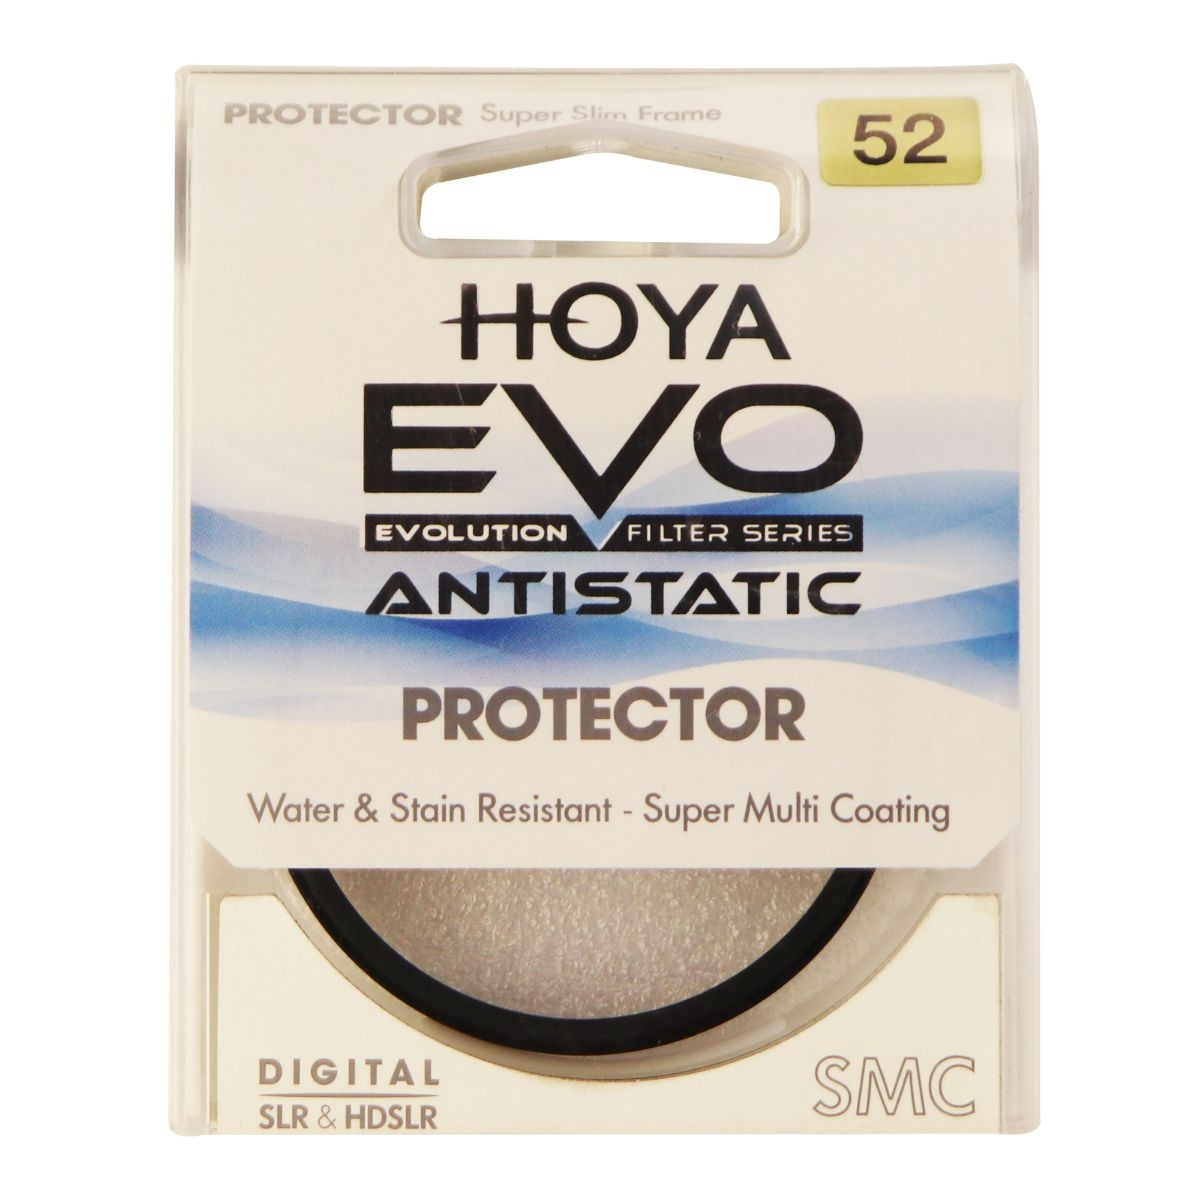 Hoya Evo Antistatic Protector Filter - 52mm - Low-Profile Filter Frame